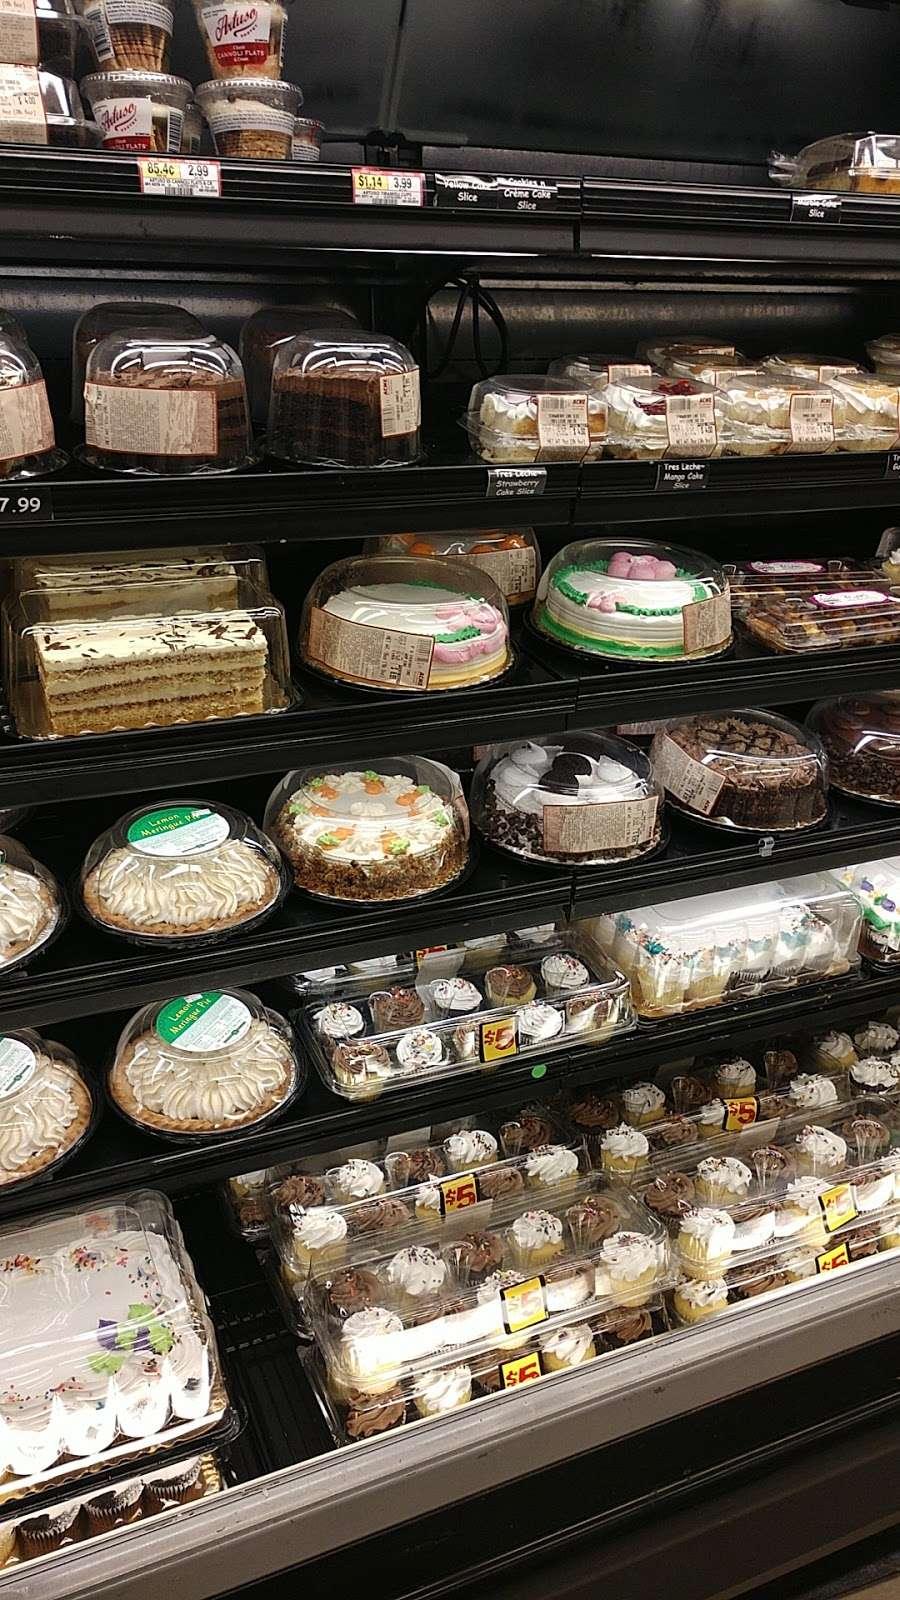 ACME Markets - store  | Photo 6 of 10 | Address: 321 NJ-440, Jersey City, NJ 07305, USA | Phone: (201) 946-2525